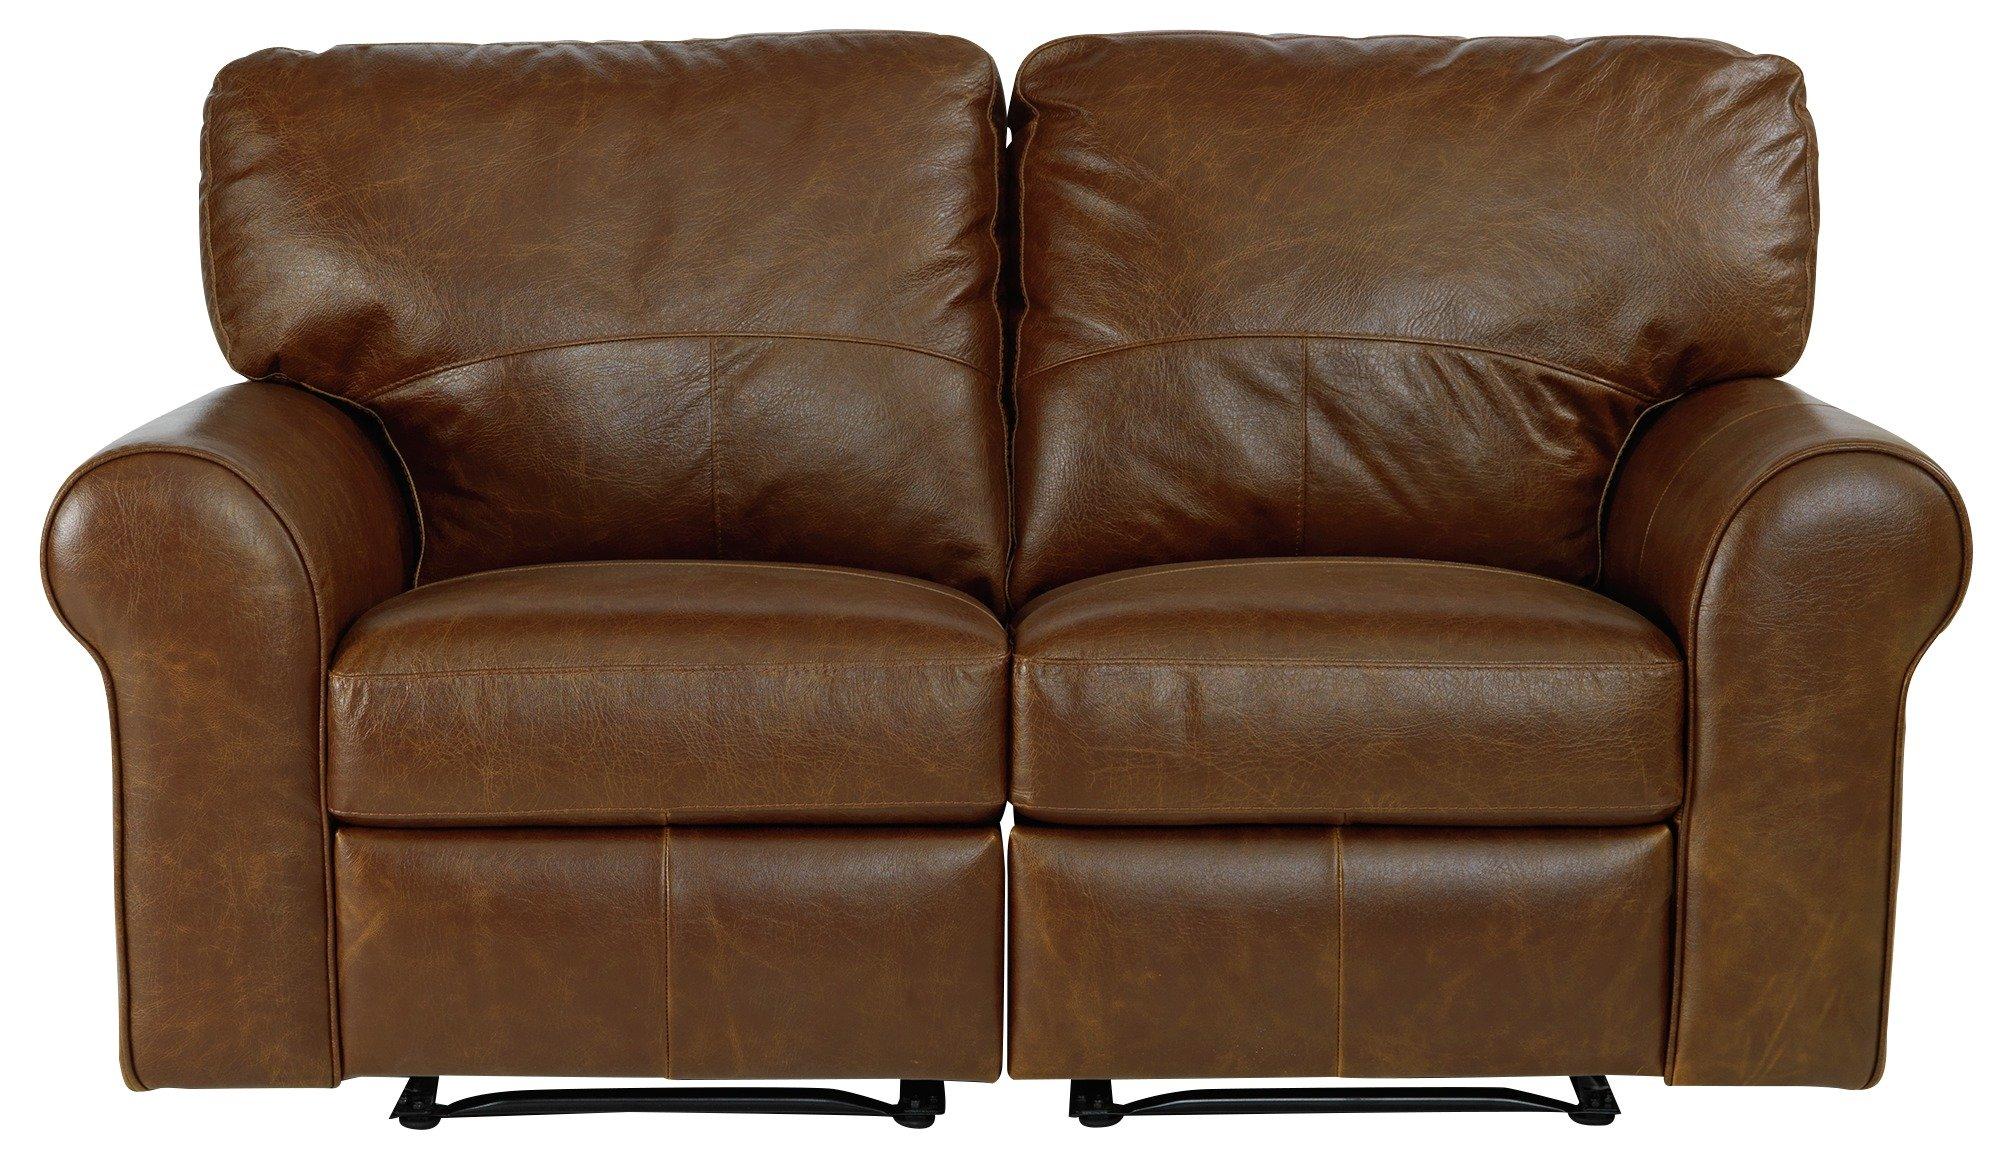 buy sofa uk velvet chesterfield nz argos home salisbury 2 seater leather recliner tan